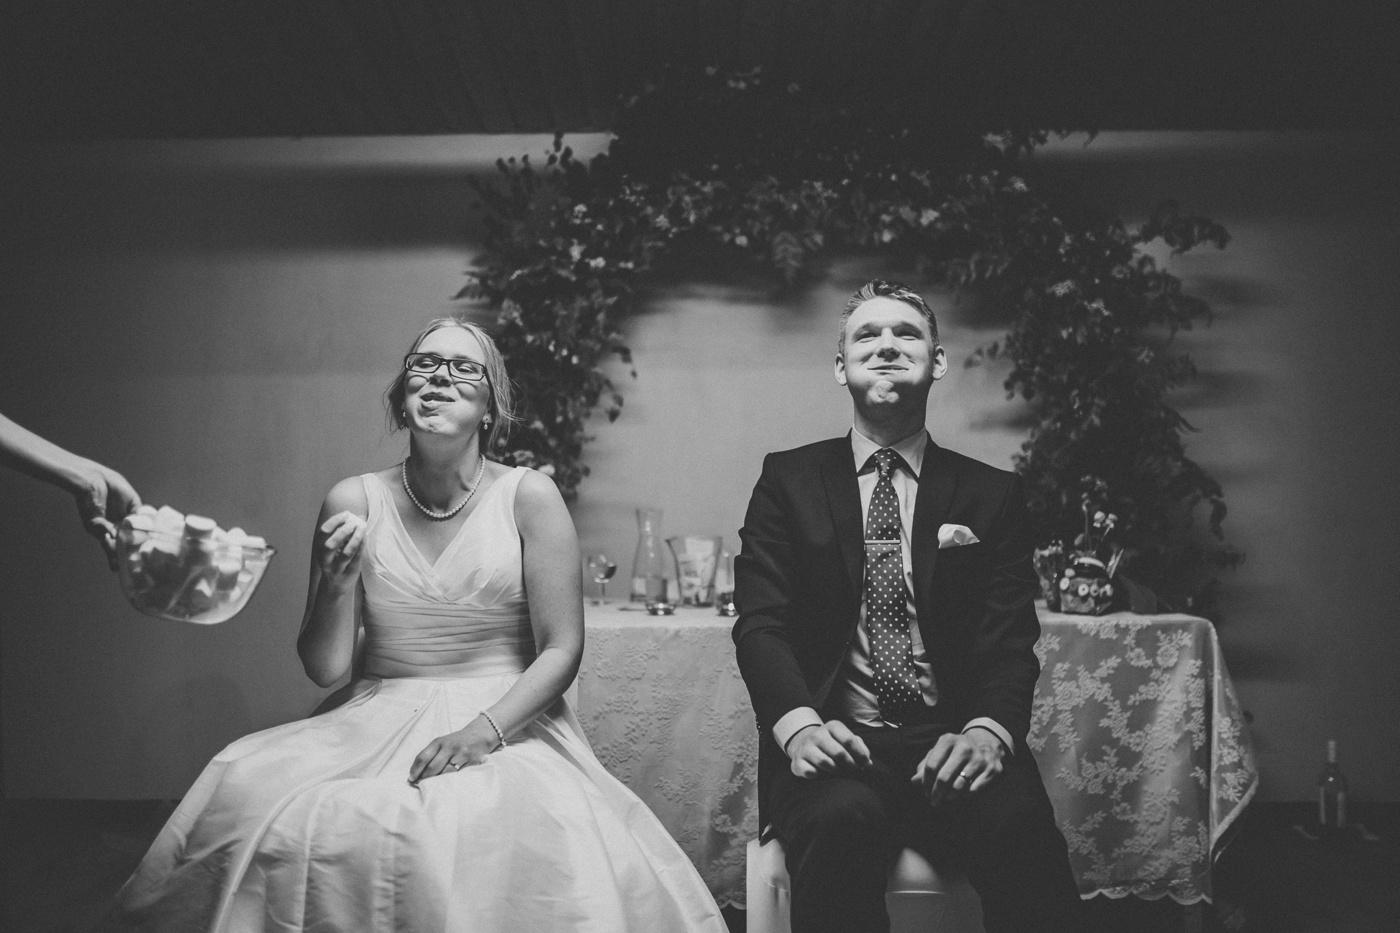 ceciliajoakim_sweden-countryside-summer-wedding_melbourne-fun-quirky-wedding-photography_79